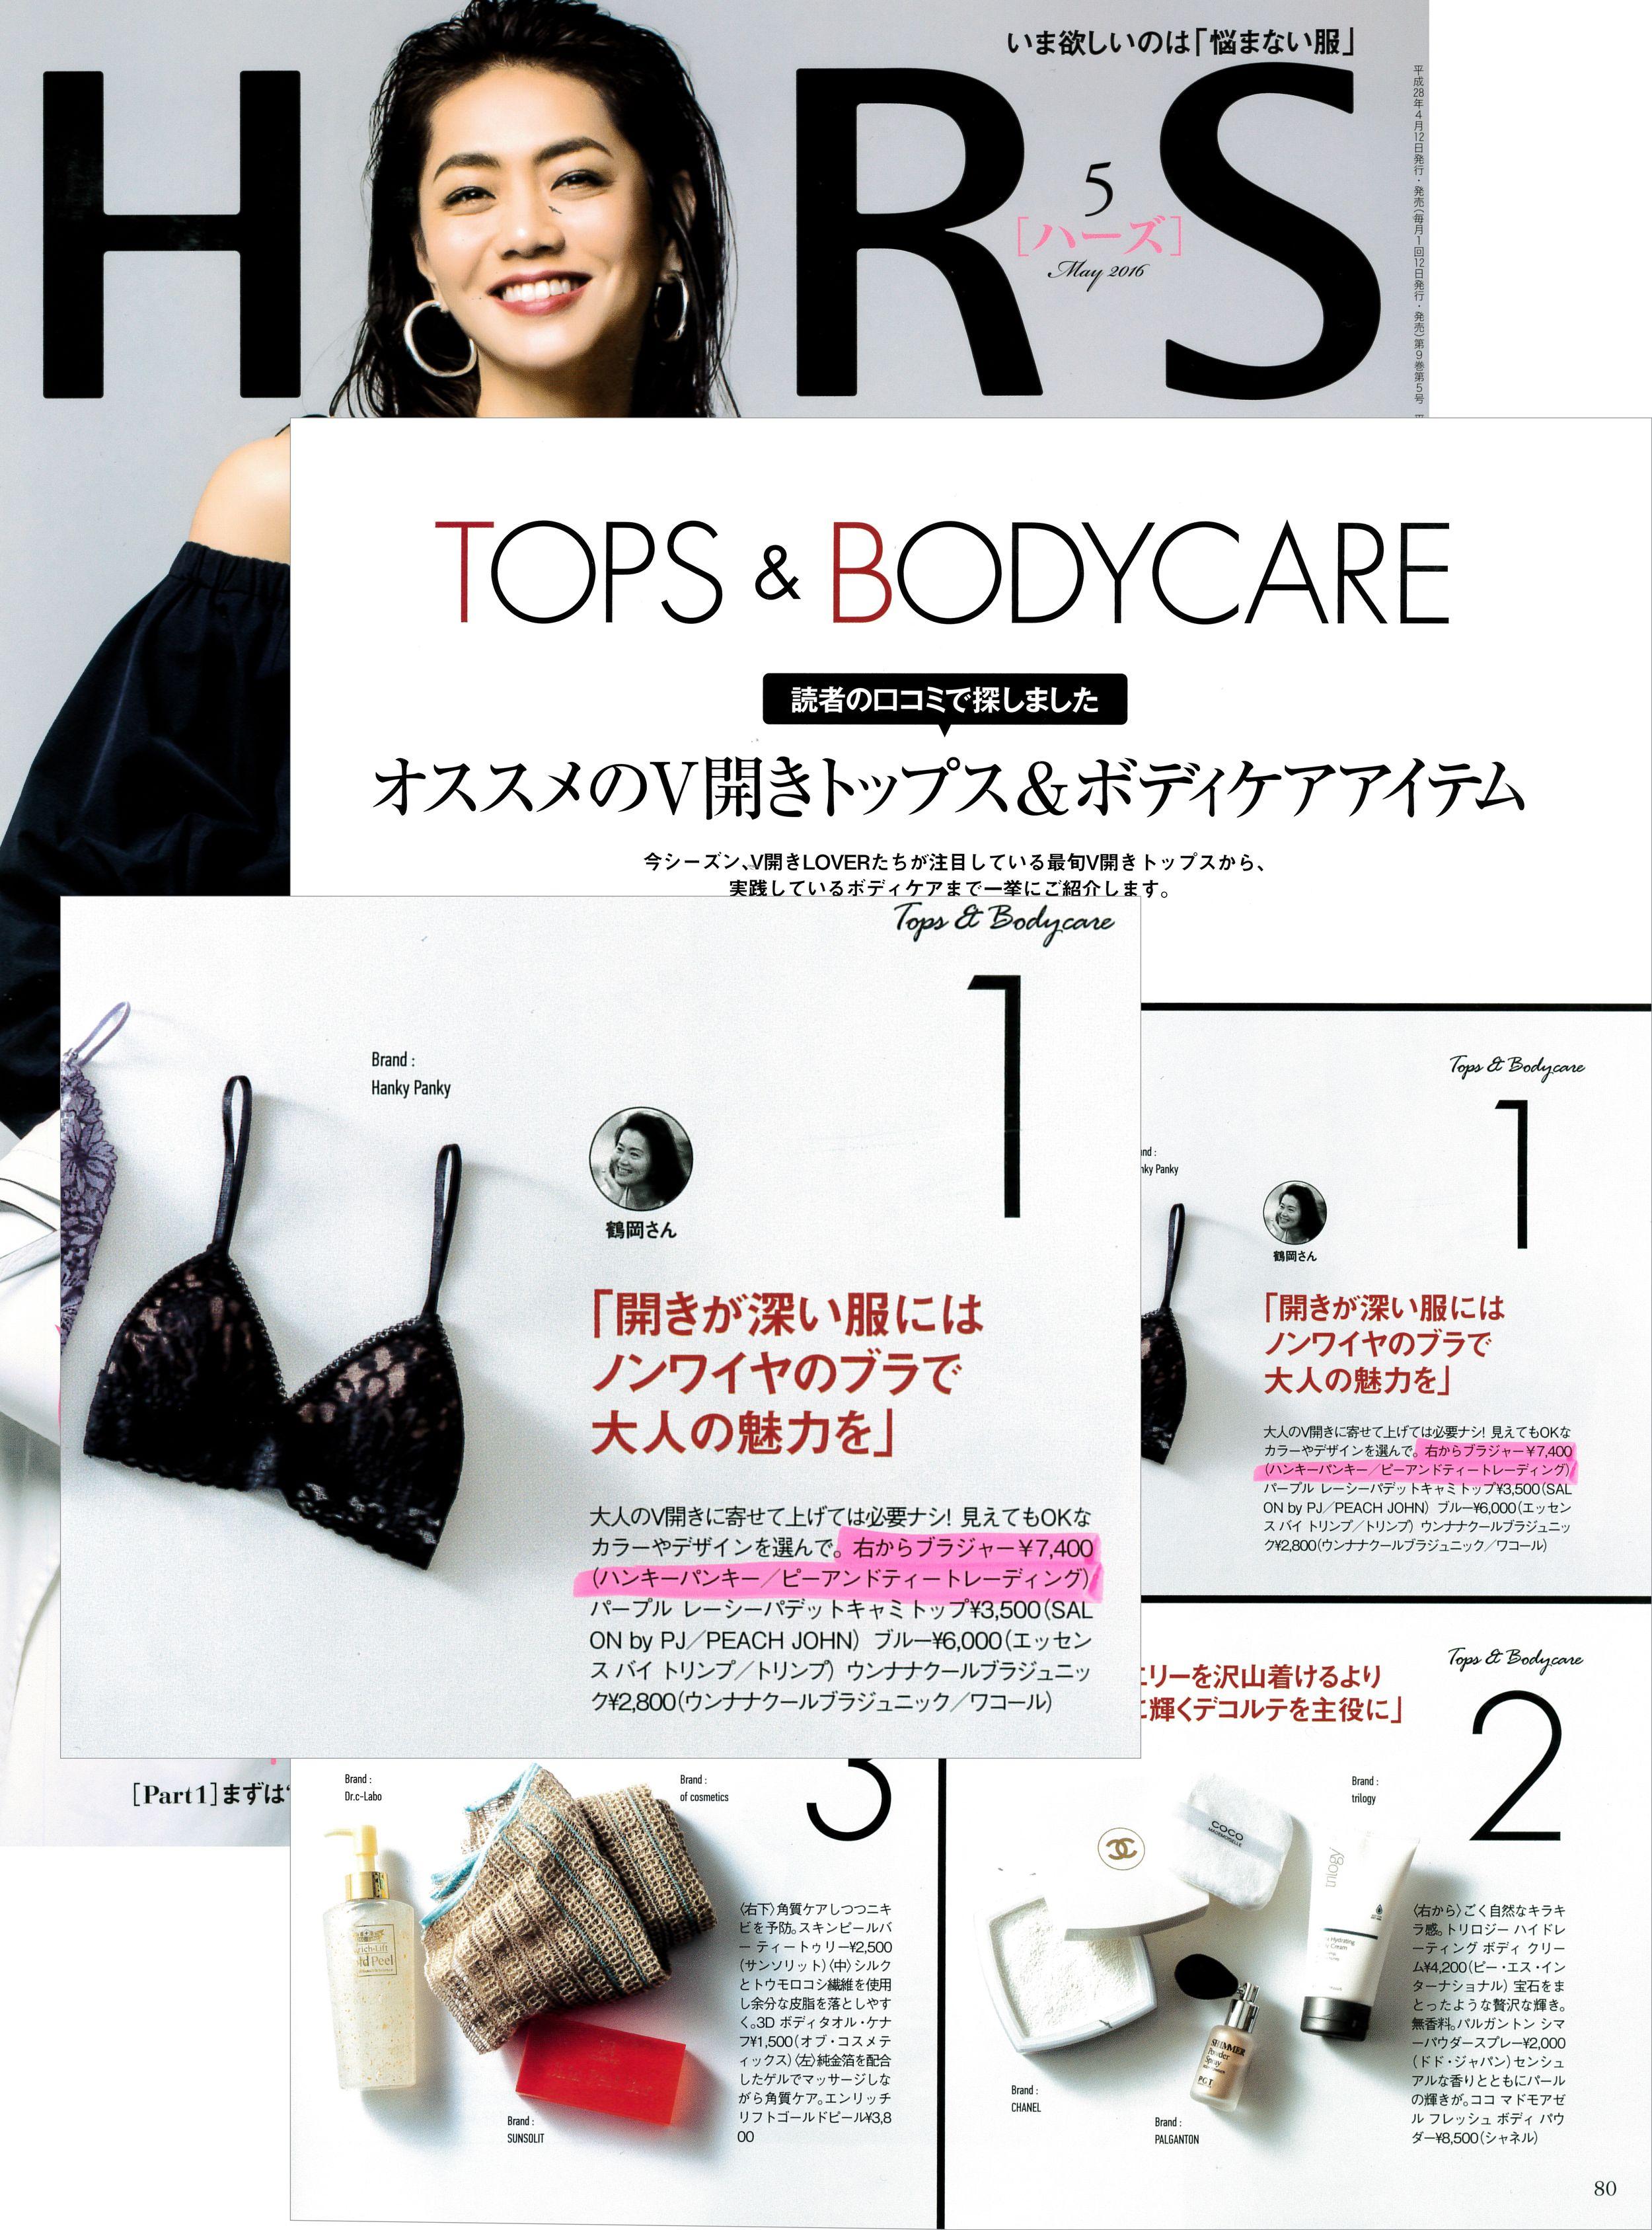 196ea821cc6c8 Hanky Panky Signature Lace Padded Bralette. Hers Magazine